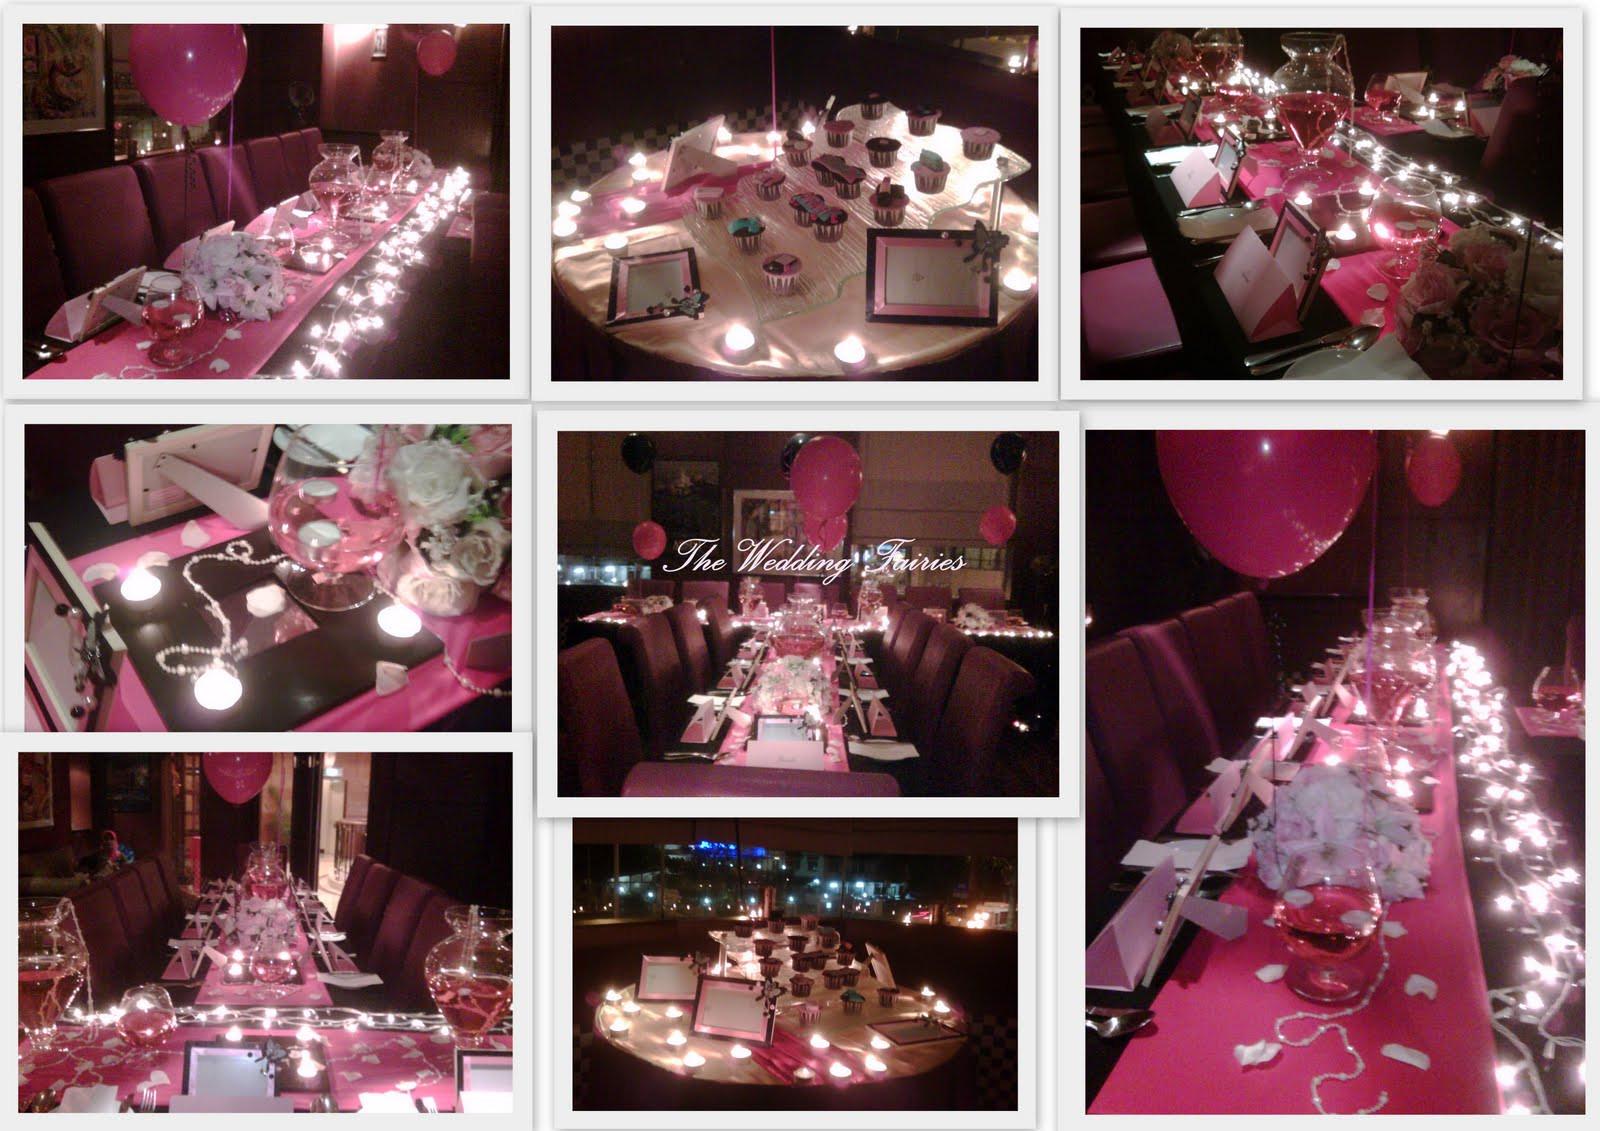 Adult Dinner Party Ideas  The Wedding Fairies June 2010